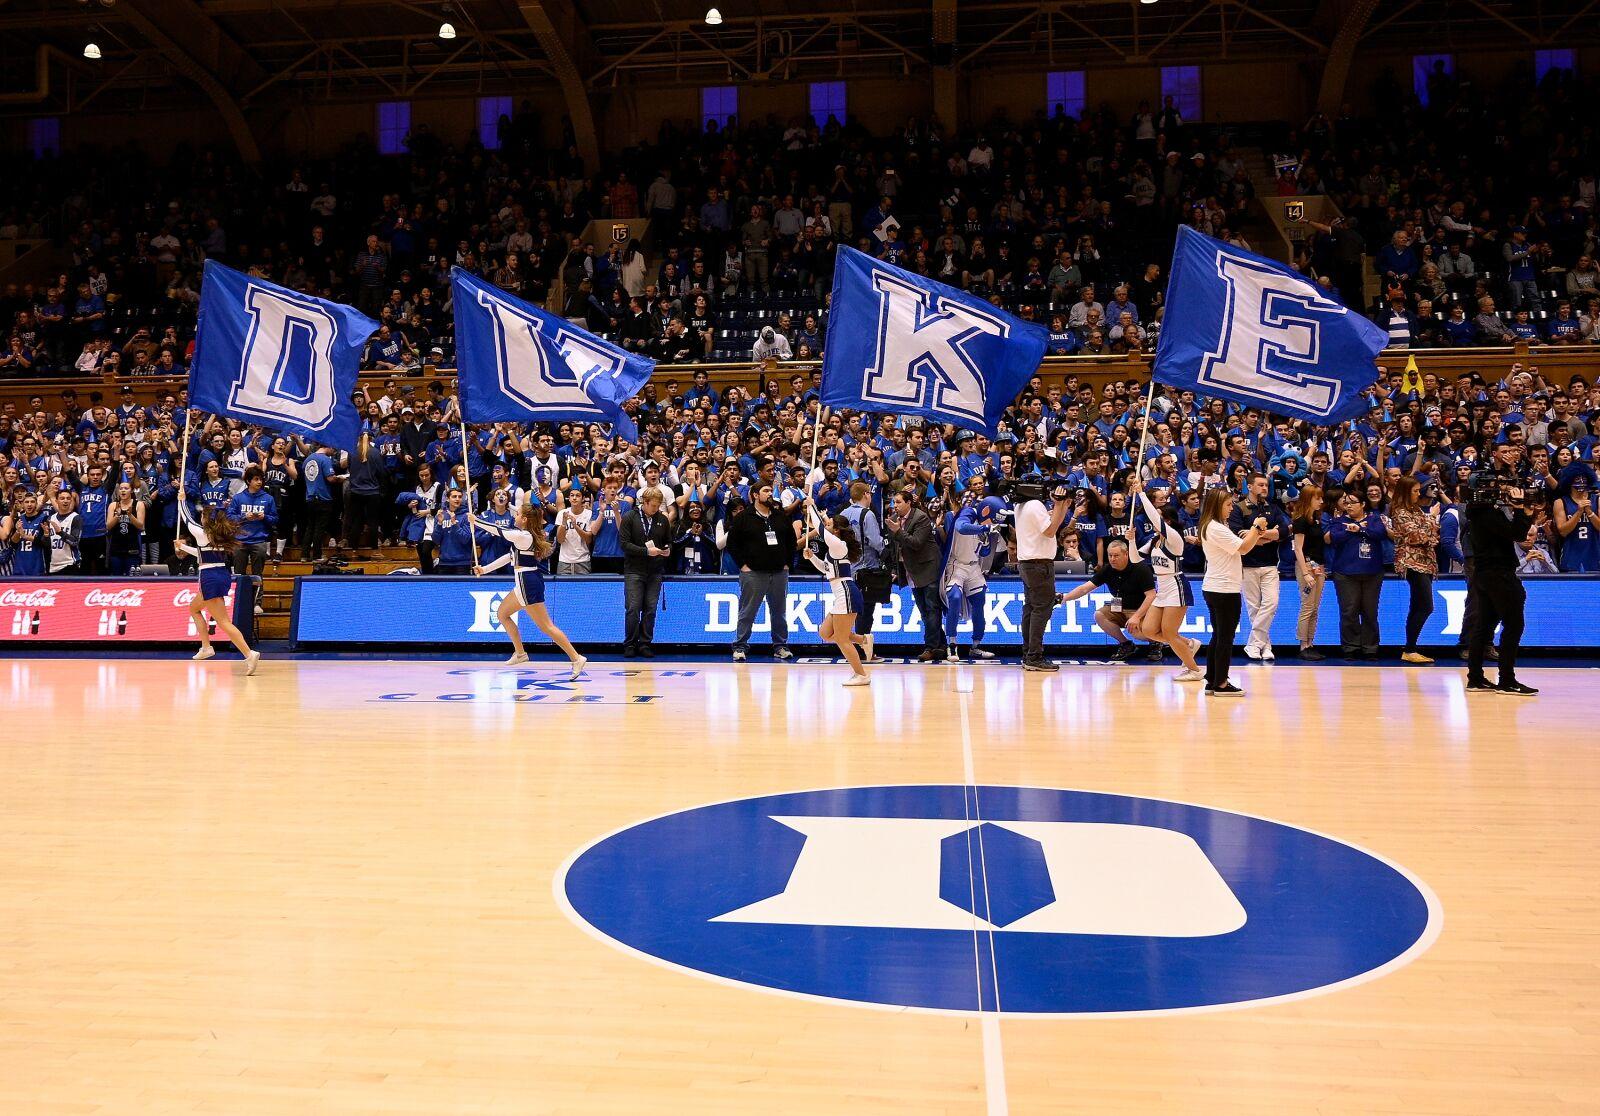 da1603a3d38 Duke Basketball: New type of showman will be in Durham next season